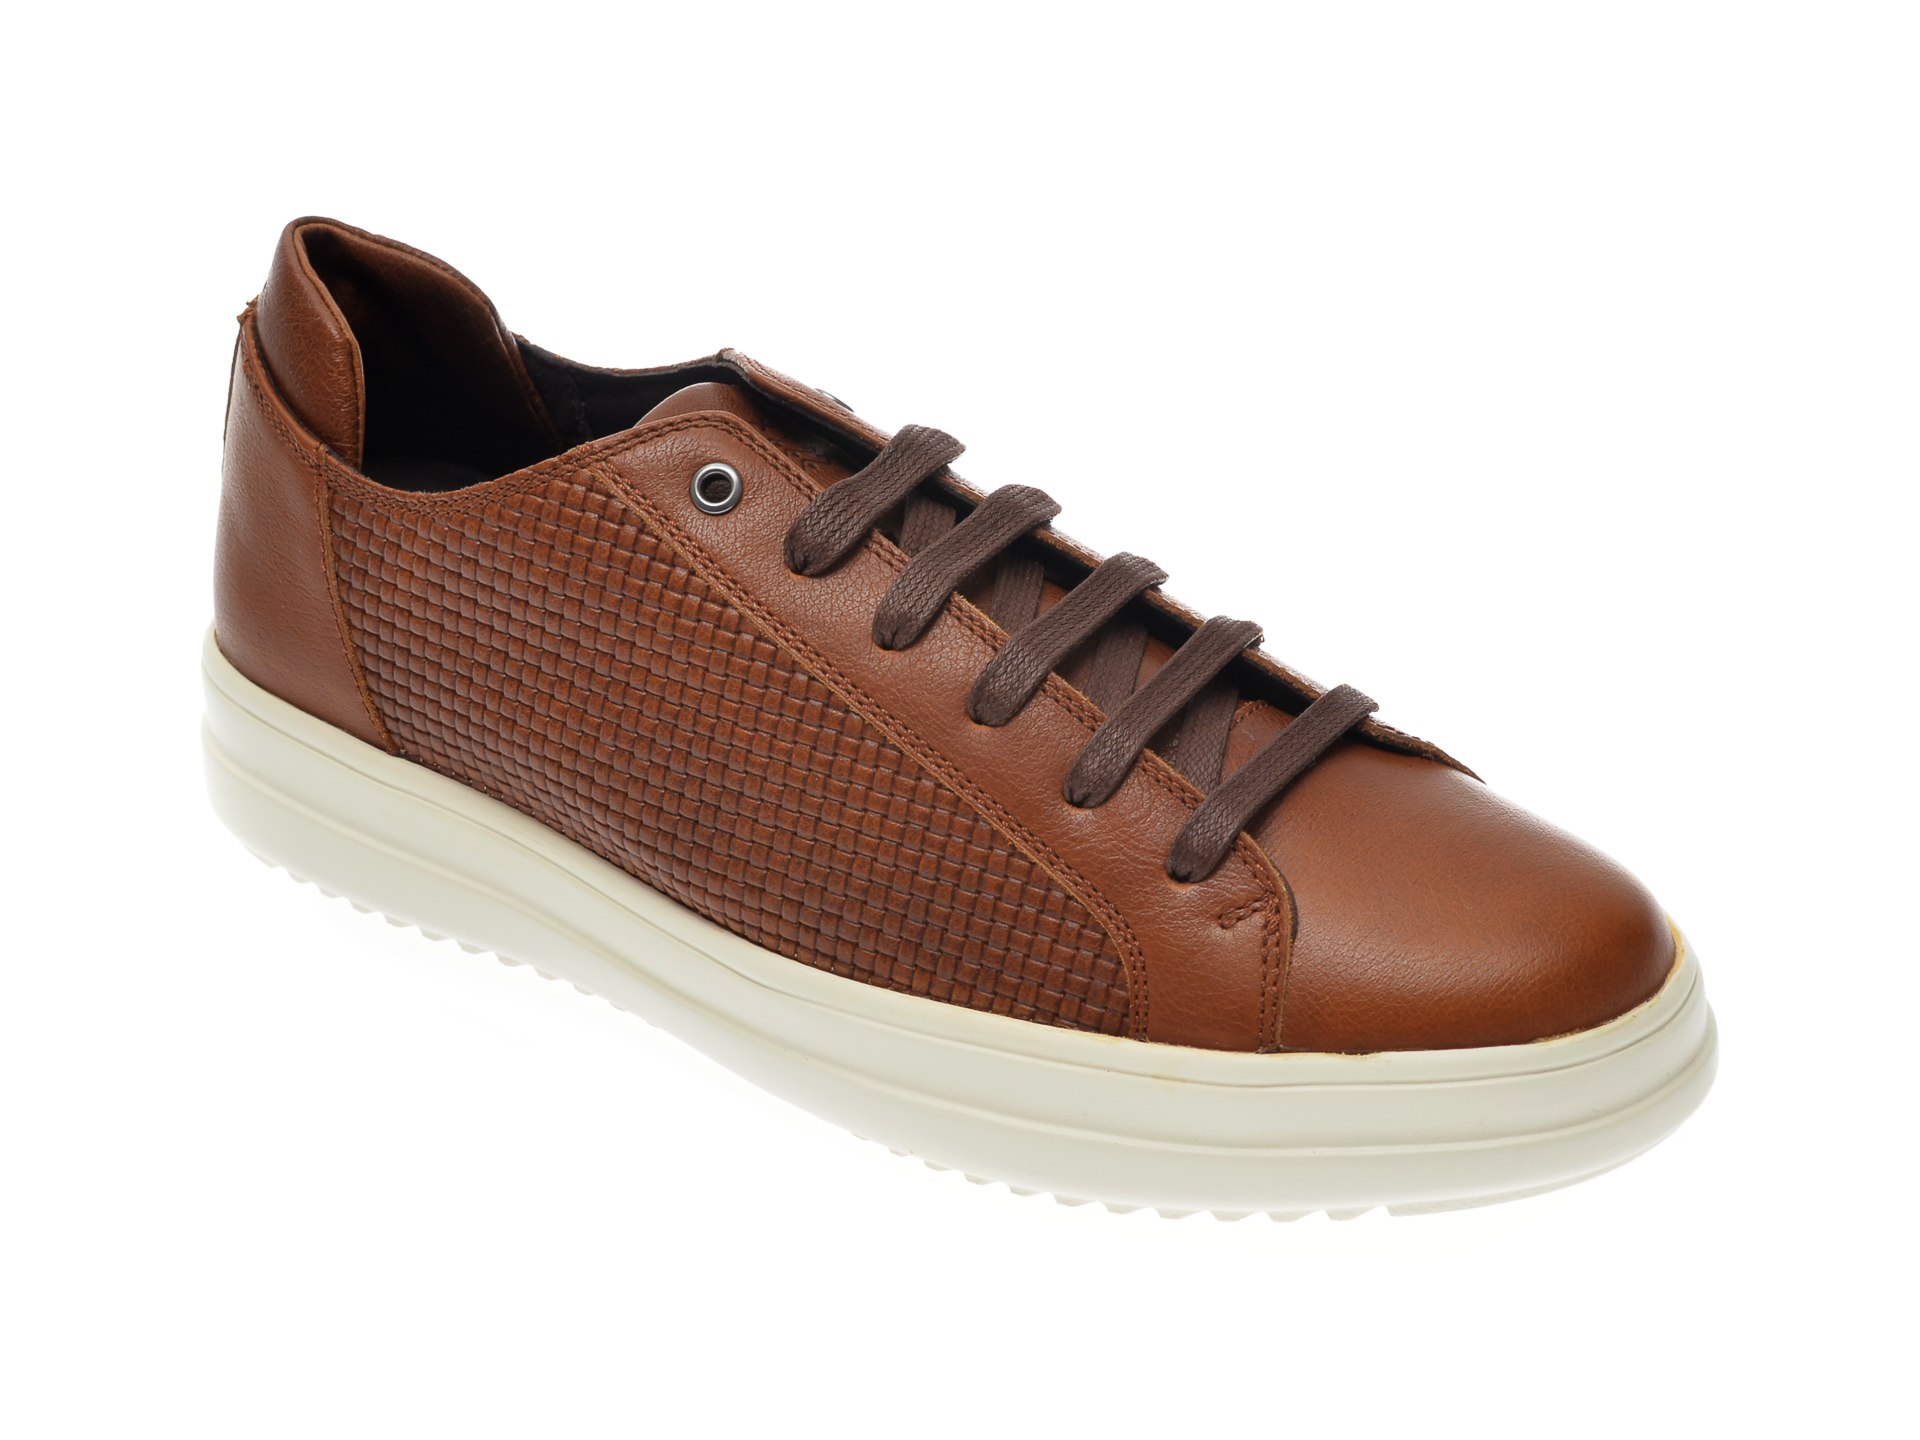 Pantofi GEOX maro, U947QD, din piele naturala imagine